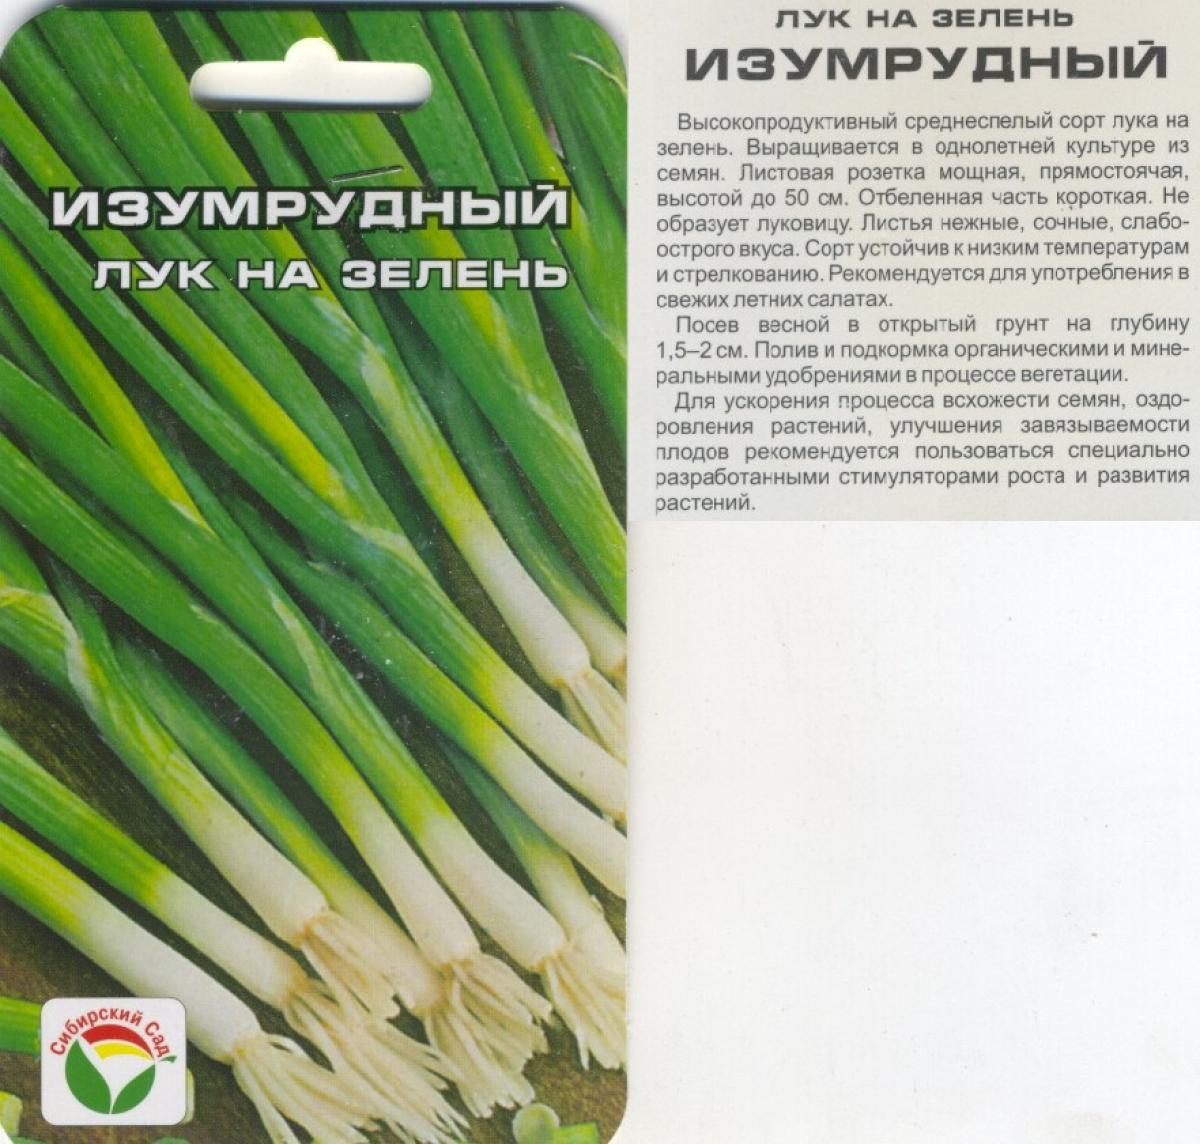 Все о выращивание зеленого лука из семян 728